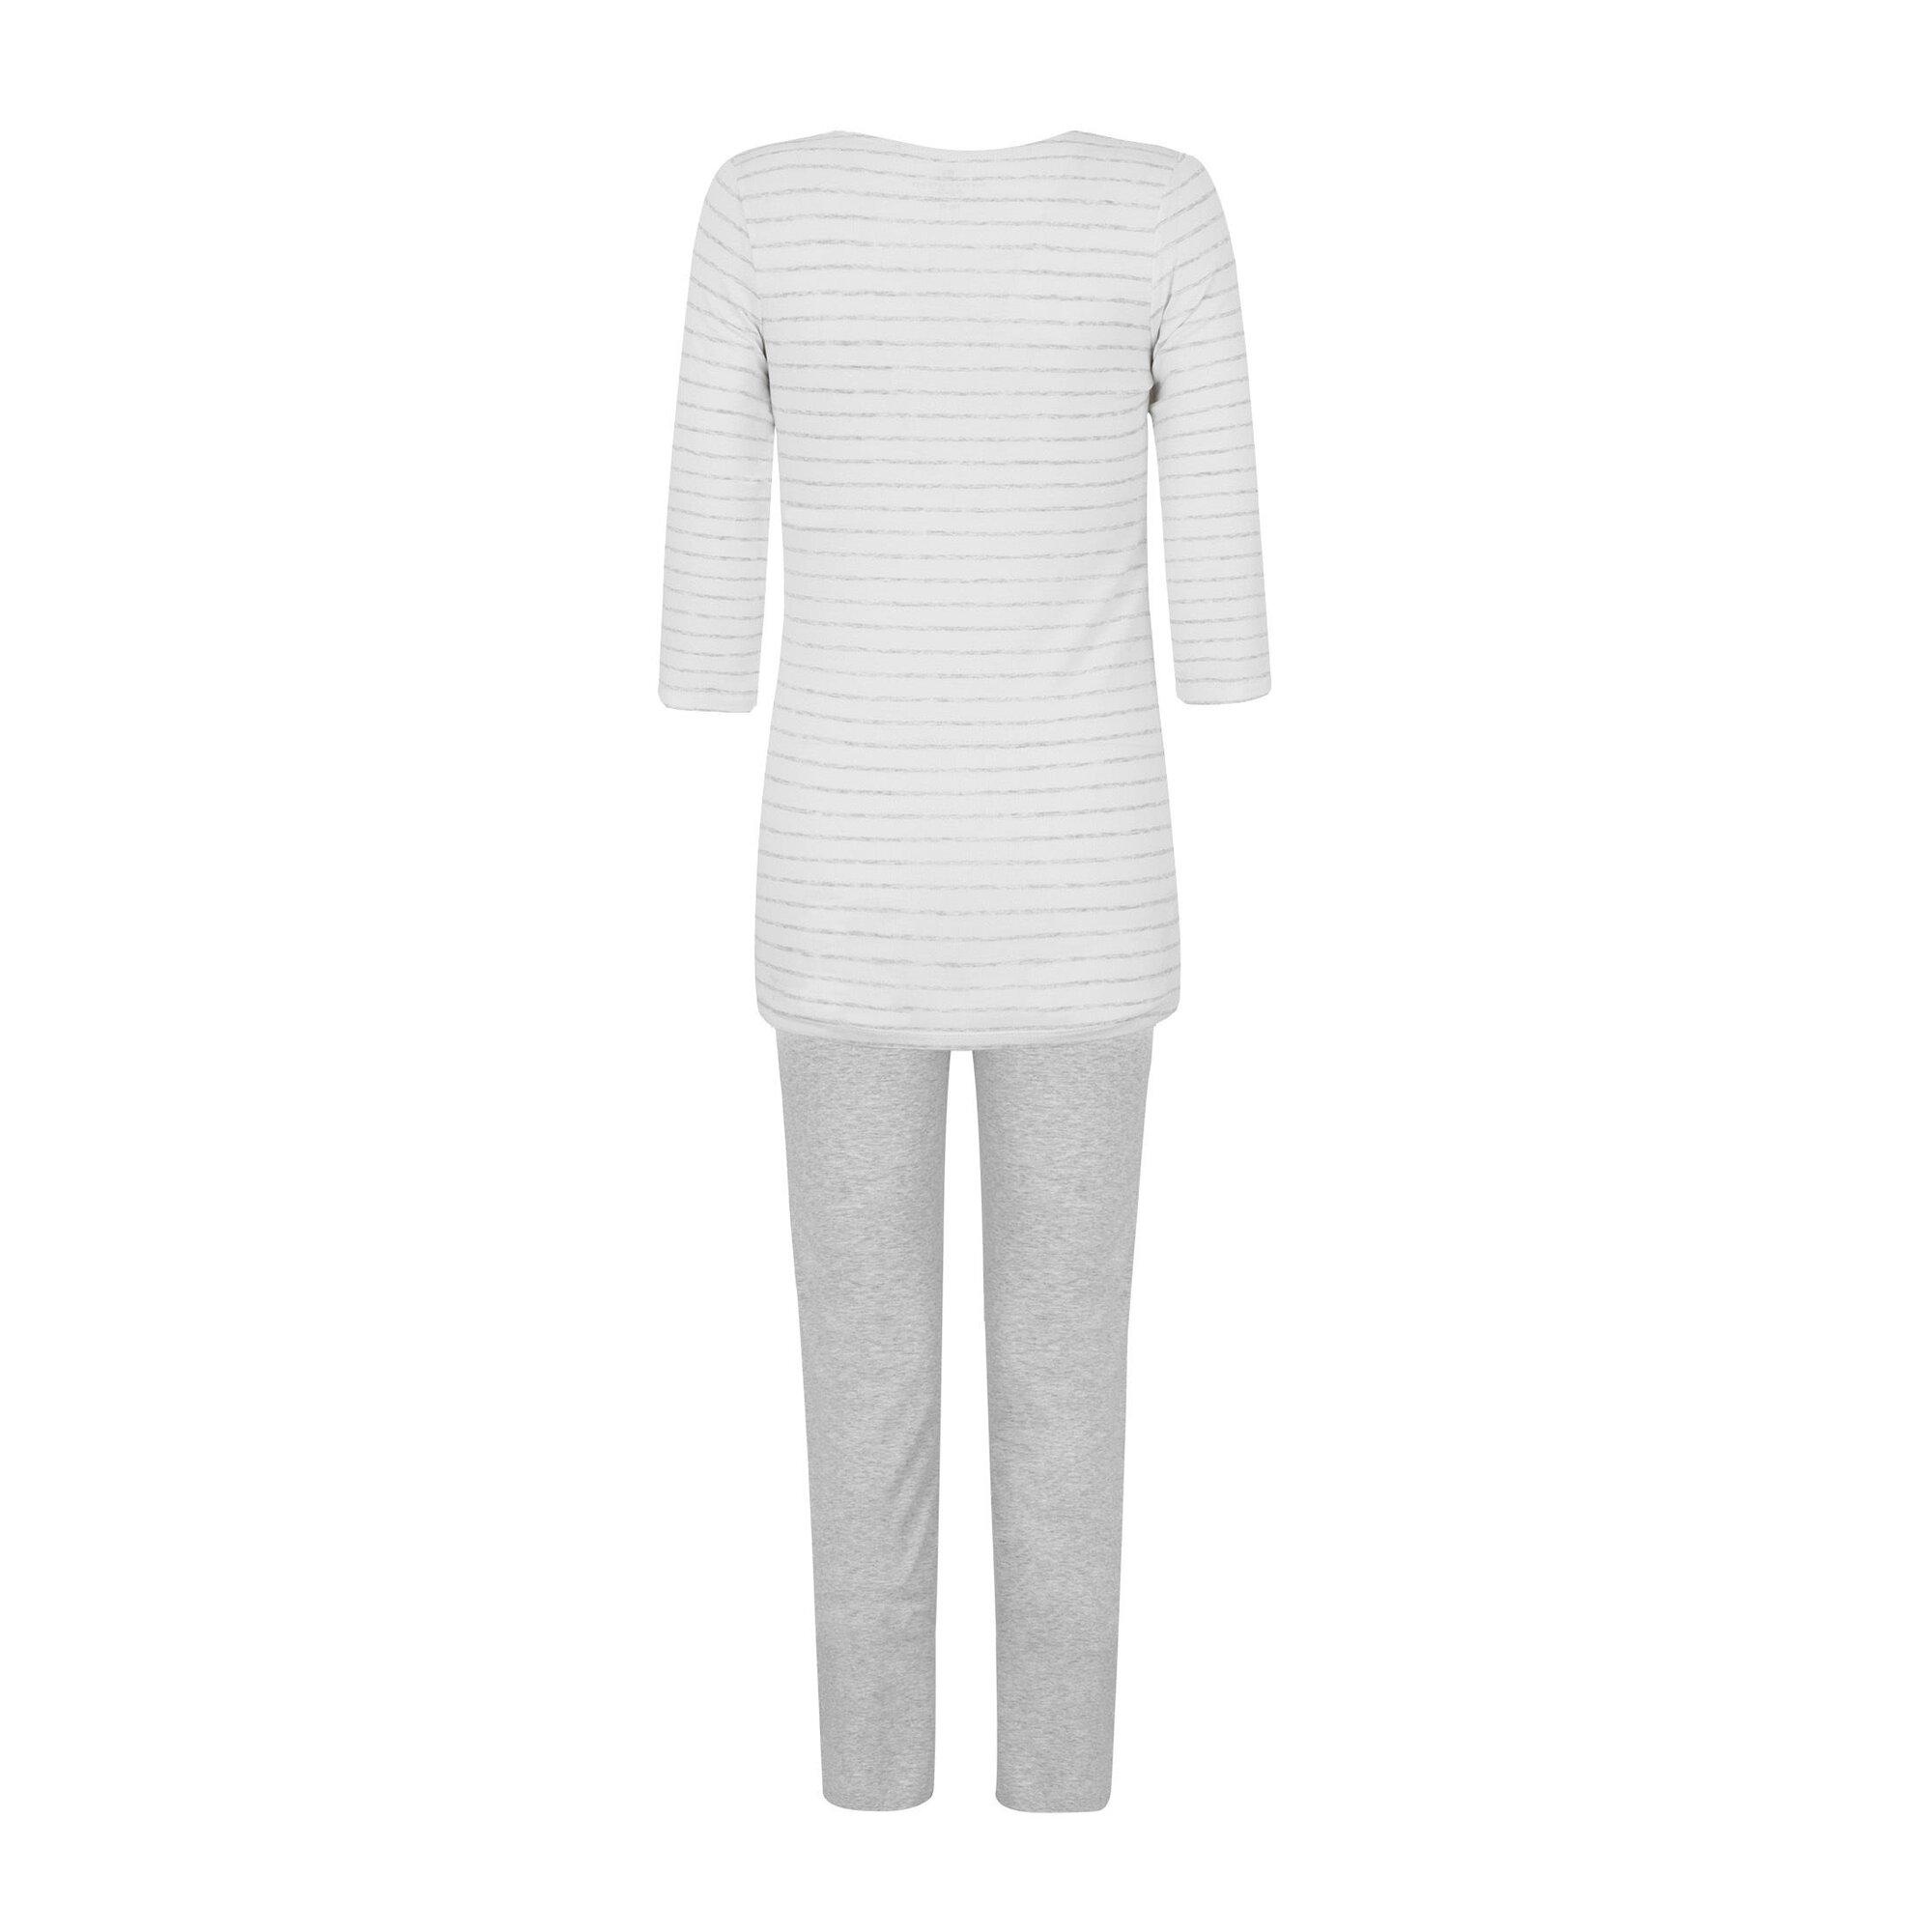 bellybutton-2tlg-set-still-pyjama-langarmshirt-hose